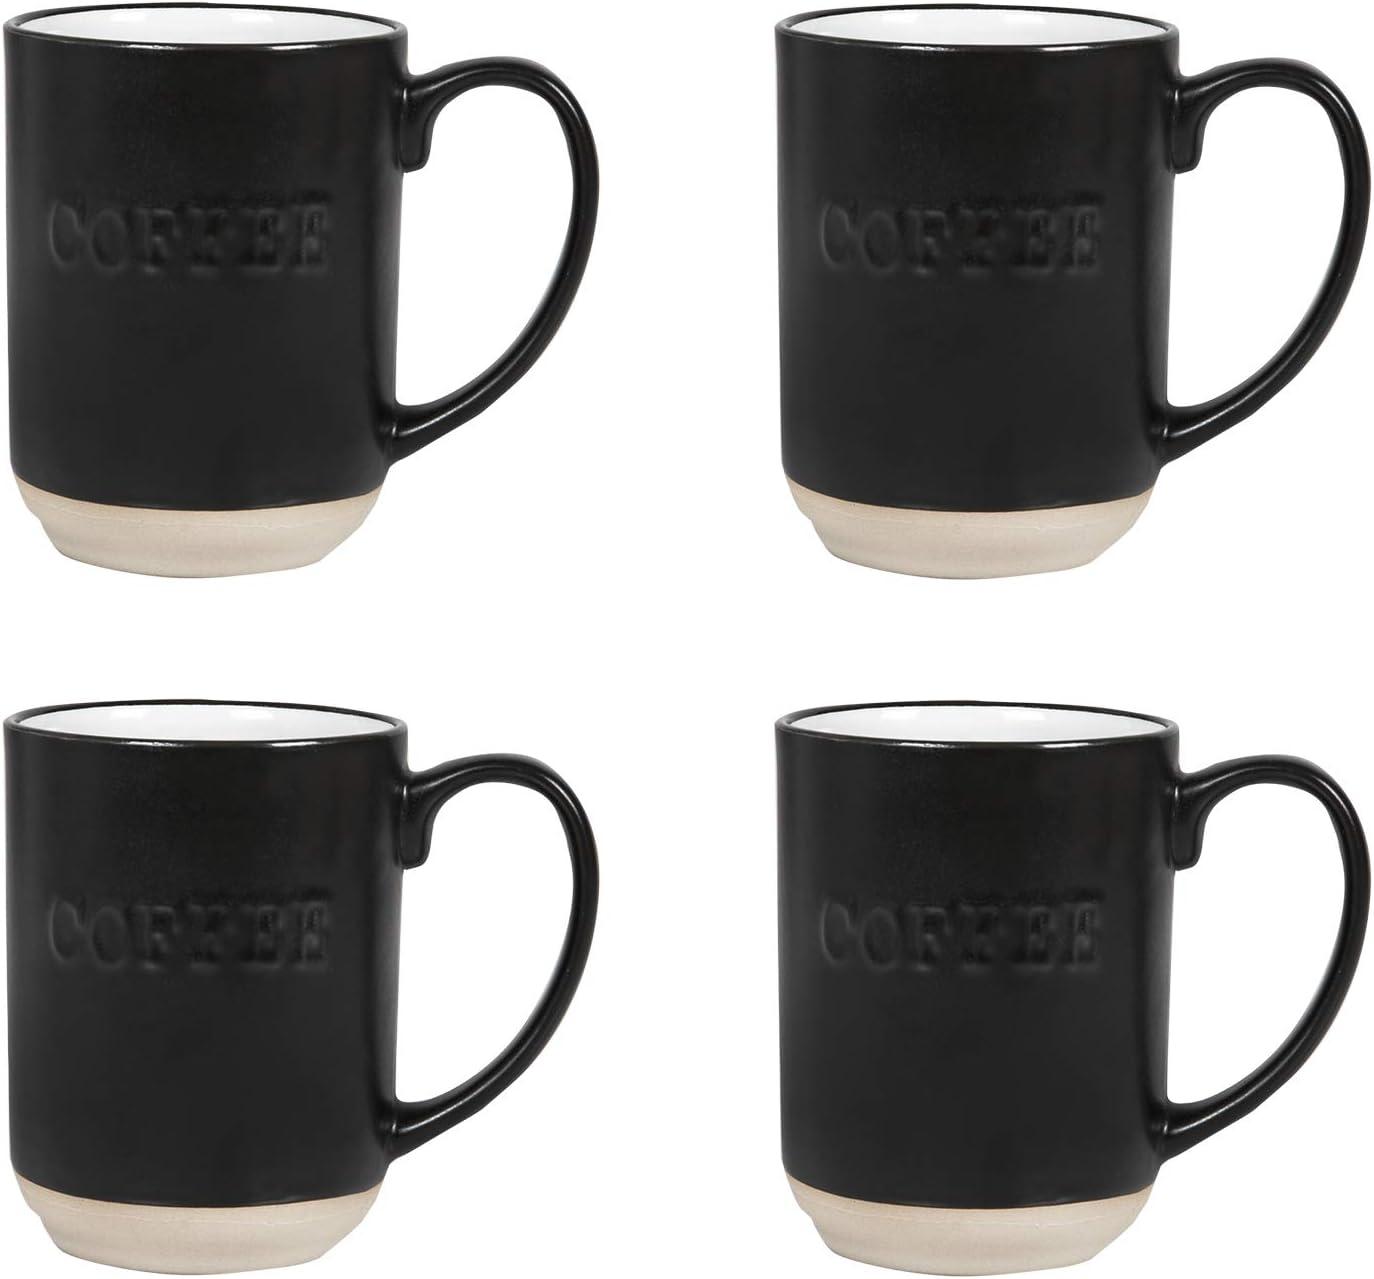 Sheffield Home Set of Stoneware Coffee Mugs- 4 Printed Coffee Cups, Tea Cups, Latte Mugs 15 oz (Black)